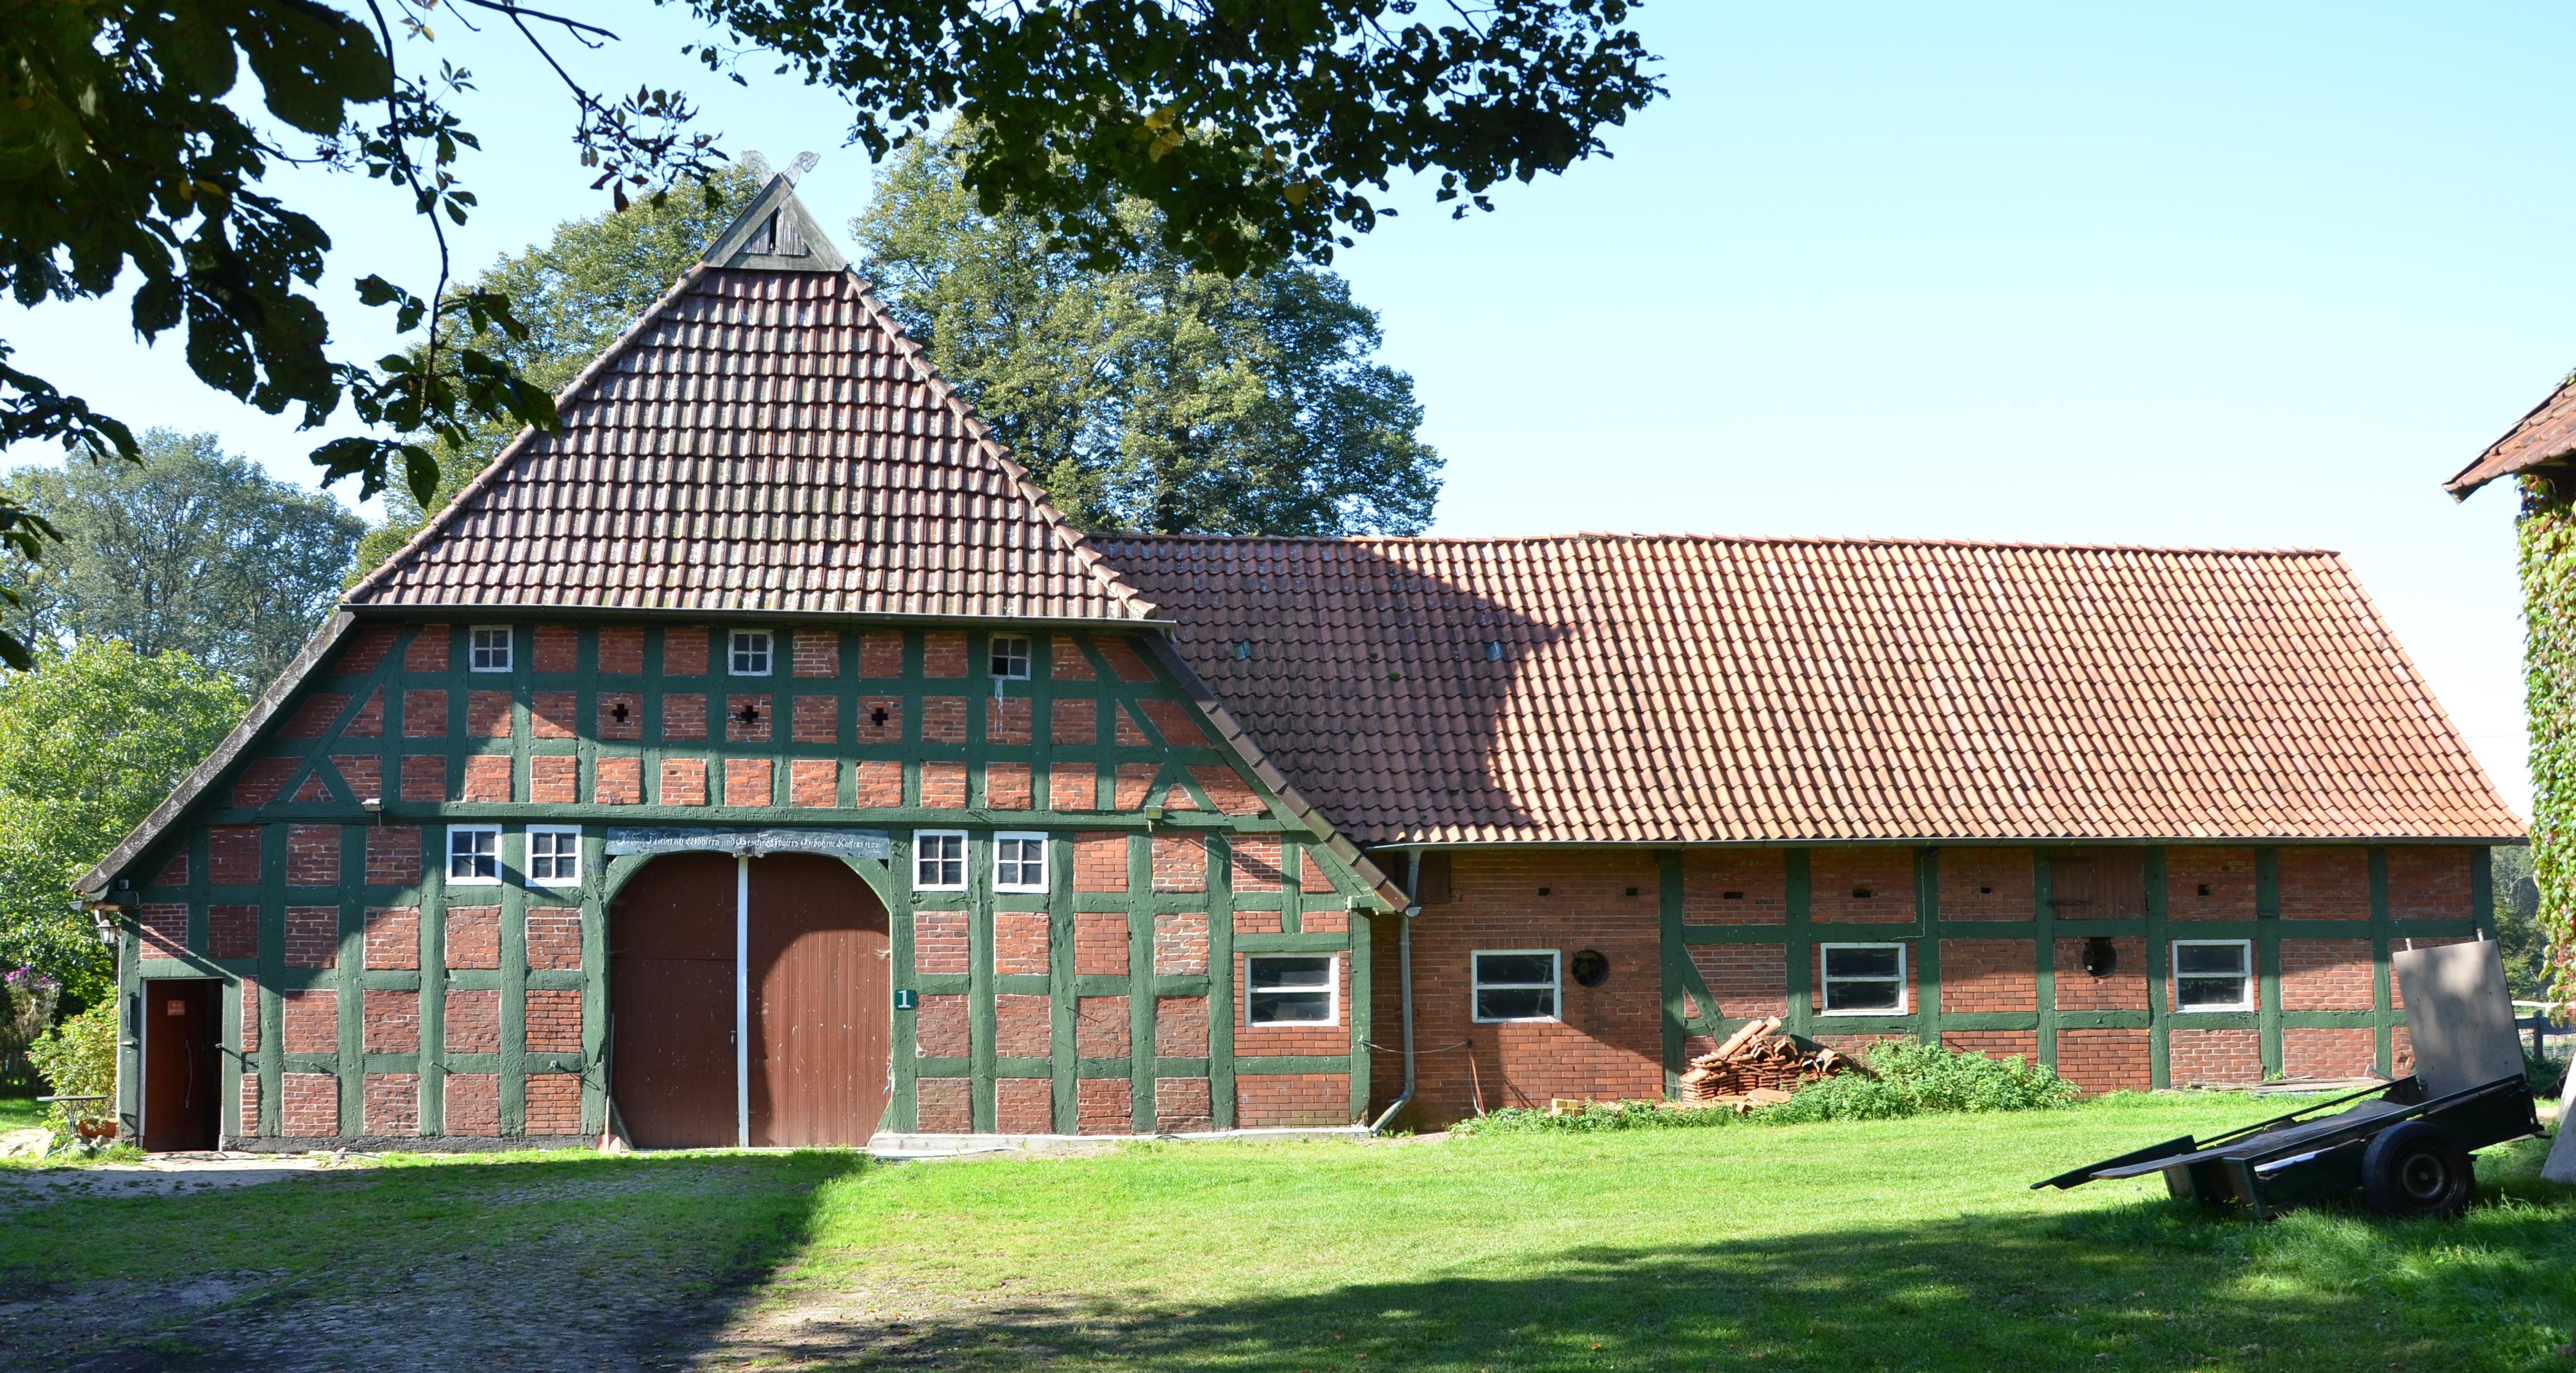 Fotos gratis : granja, techo, edificio, granero, Monumento, cabaña ...